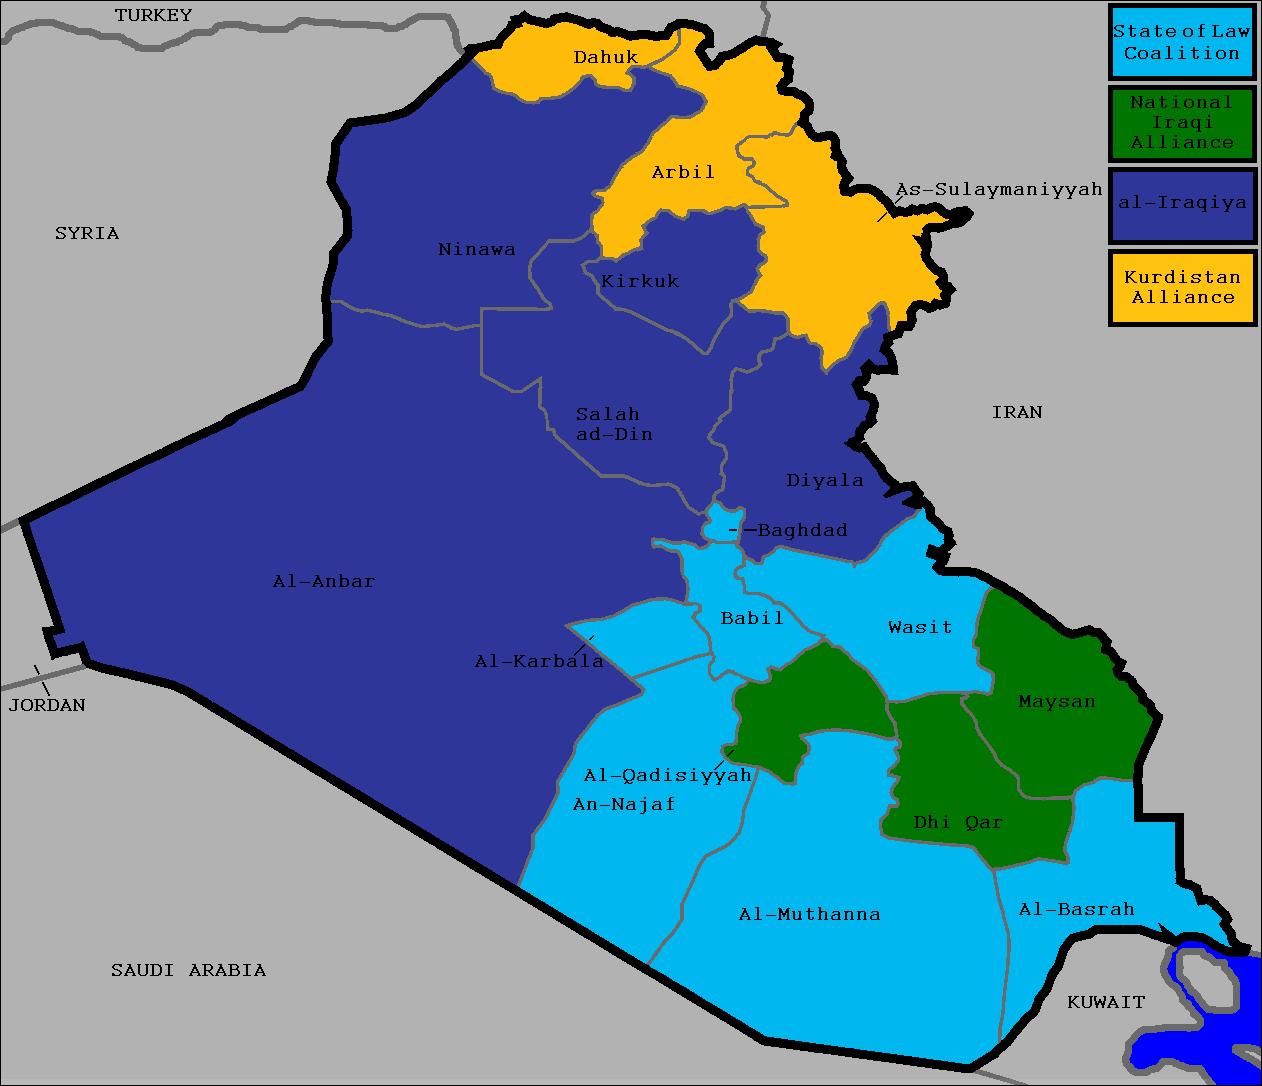 File:2010 Iraqi election map.png - Wikimedia Commons